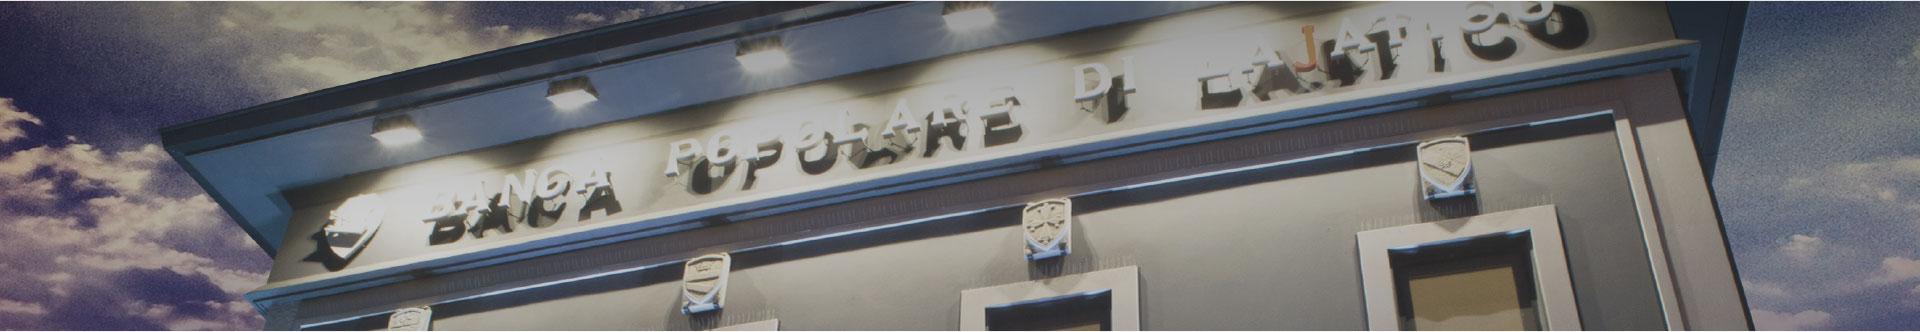 37+ Banco popolare pisa orari information